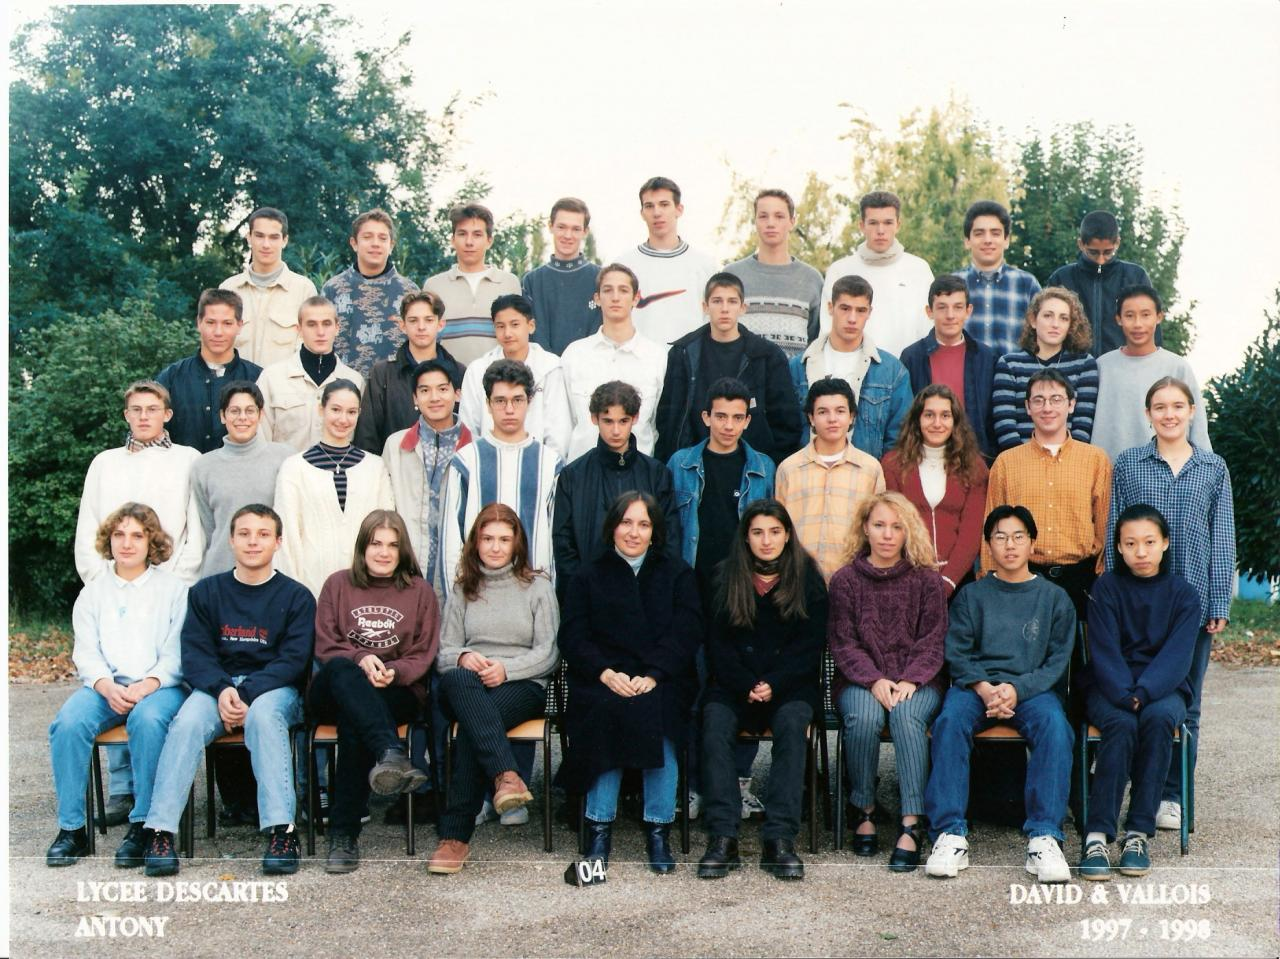 1998 - 1S3 - DAVID